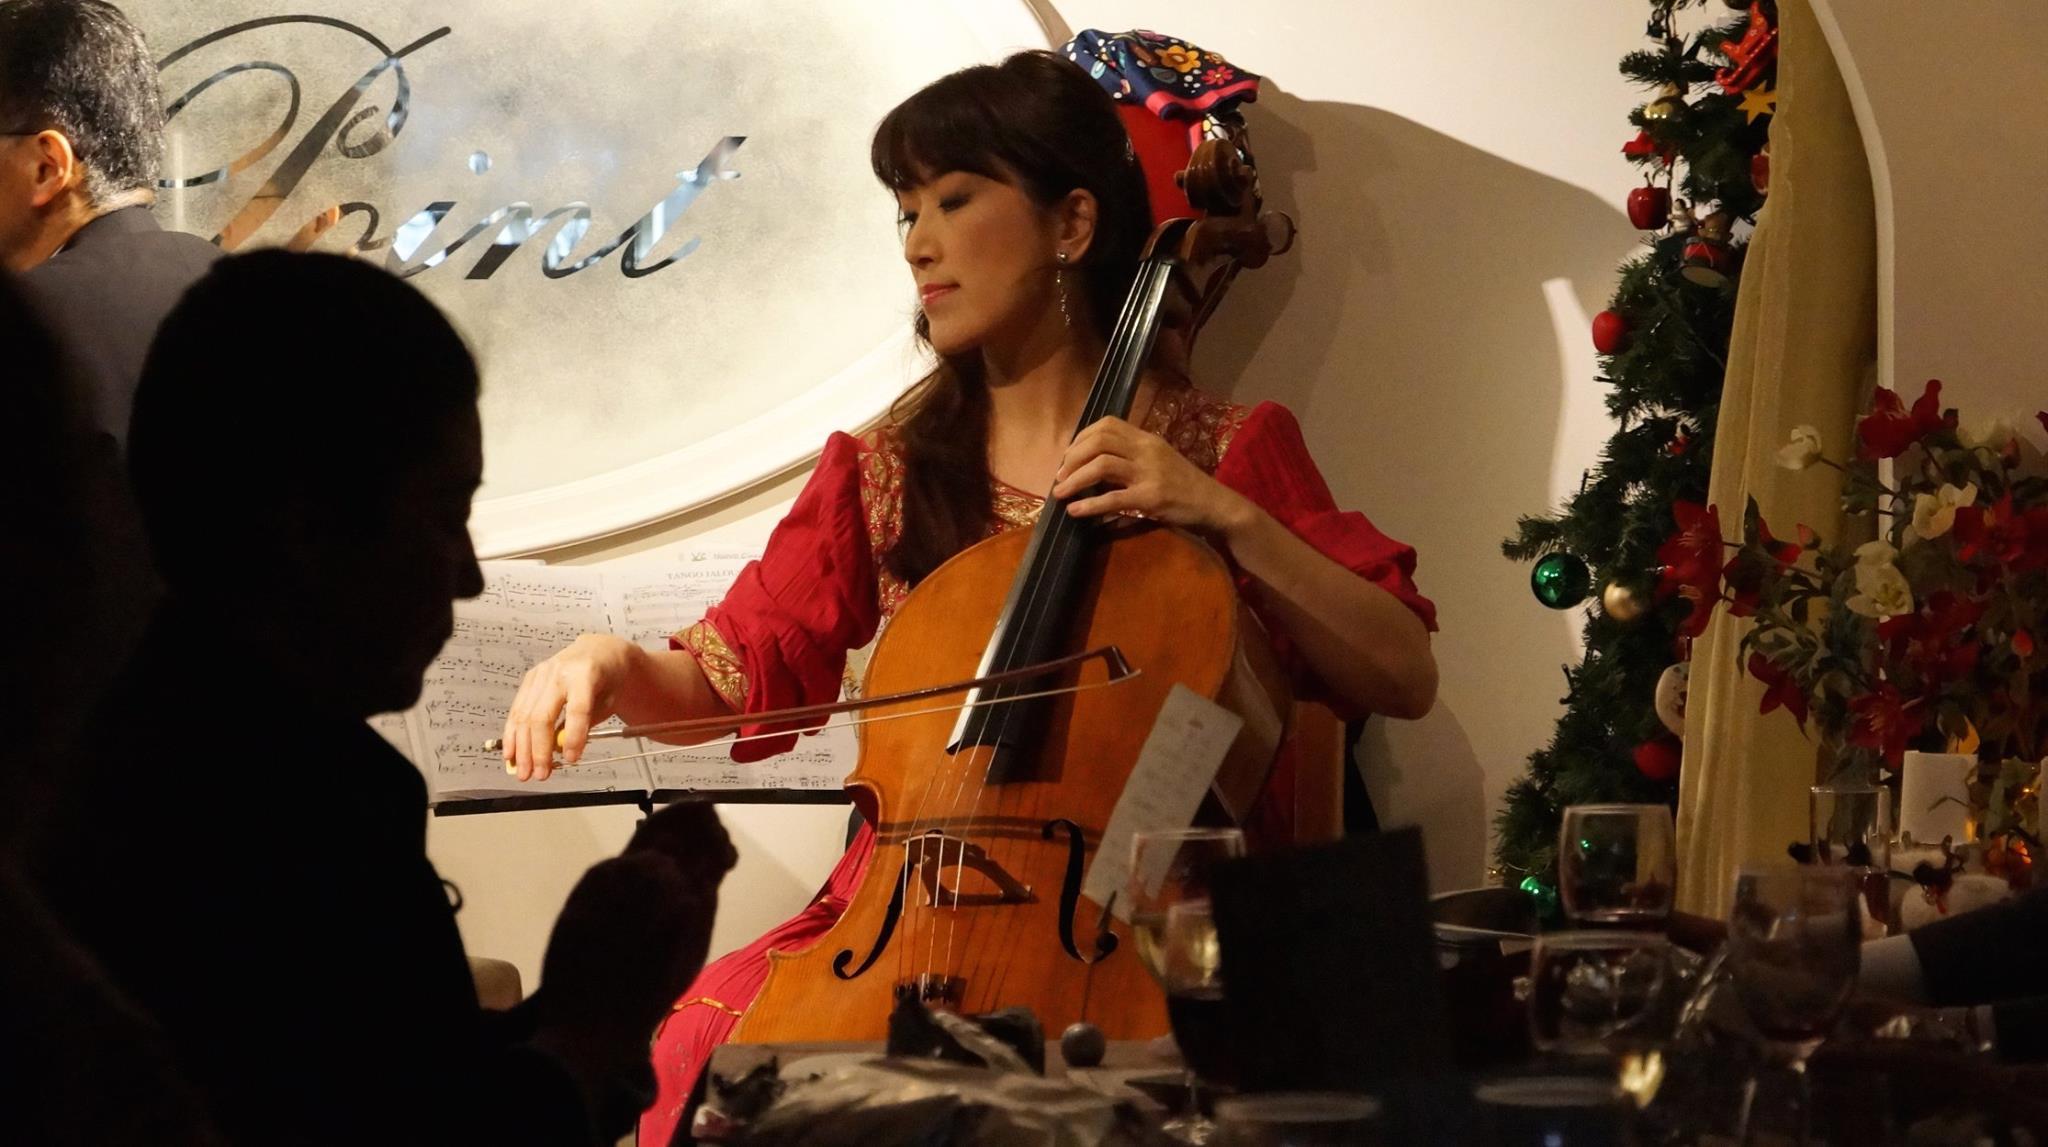 Yumiko morooka